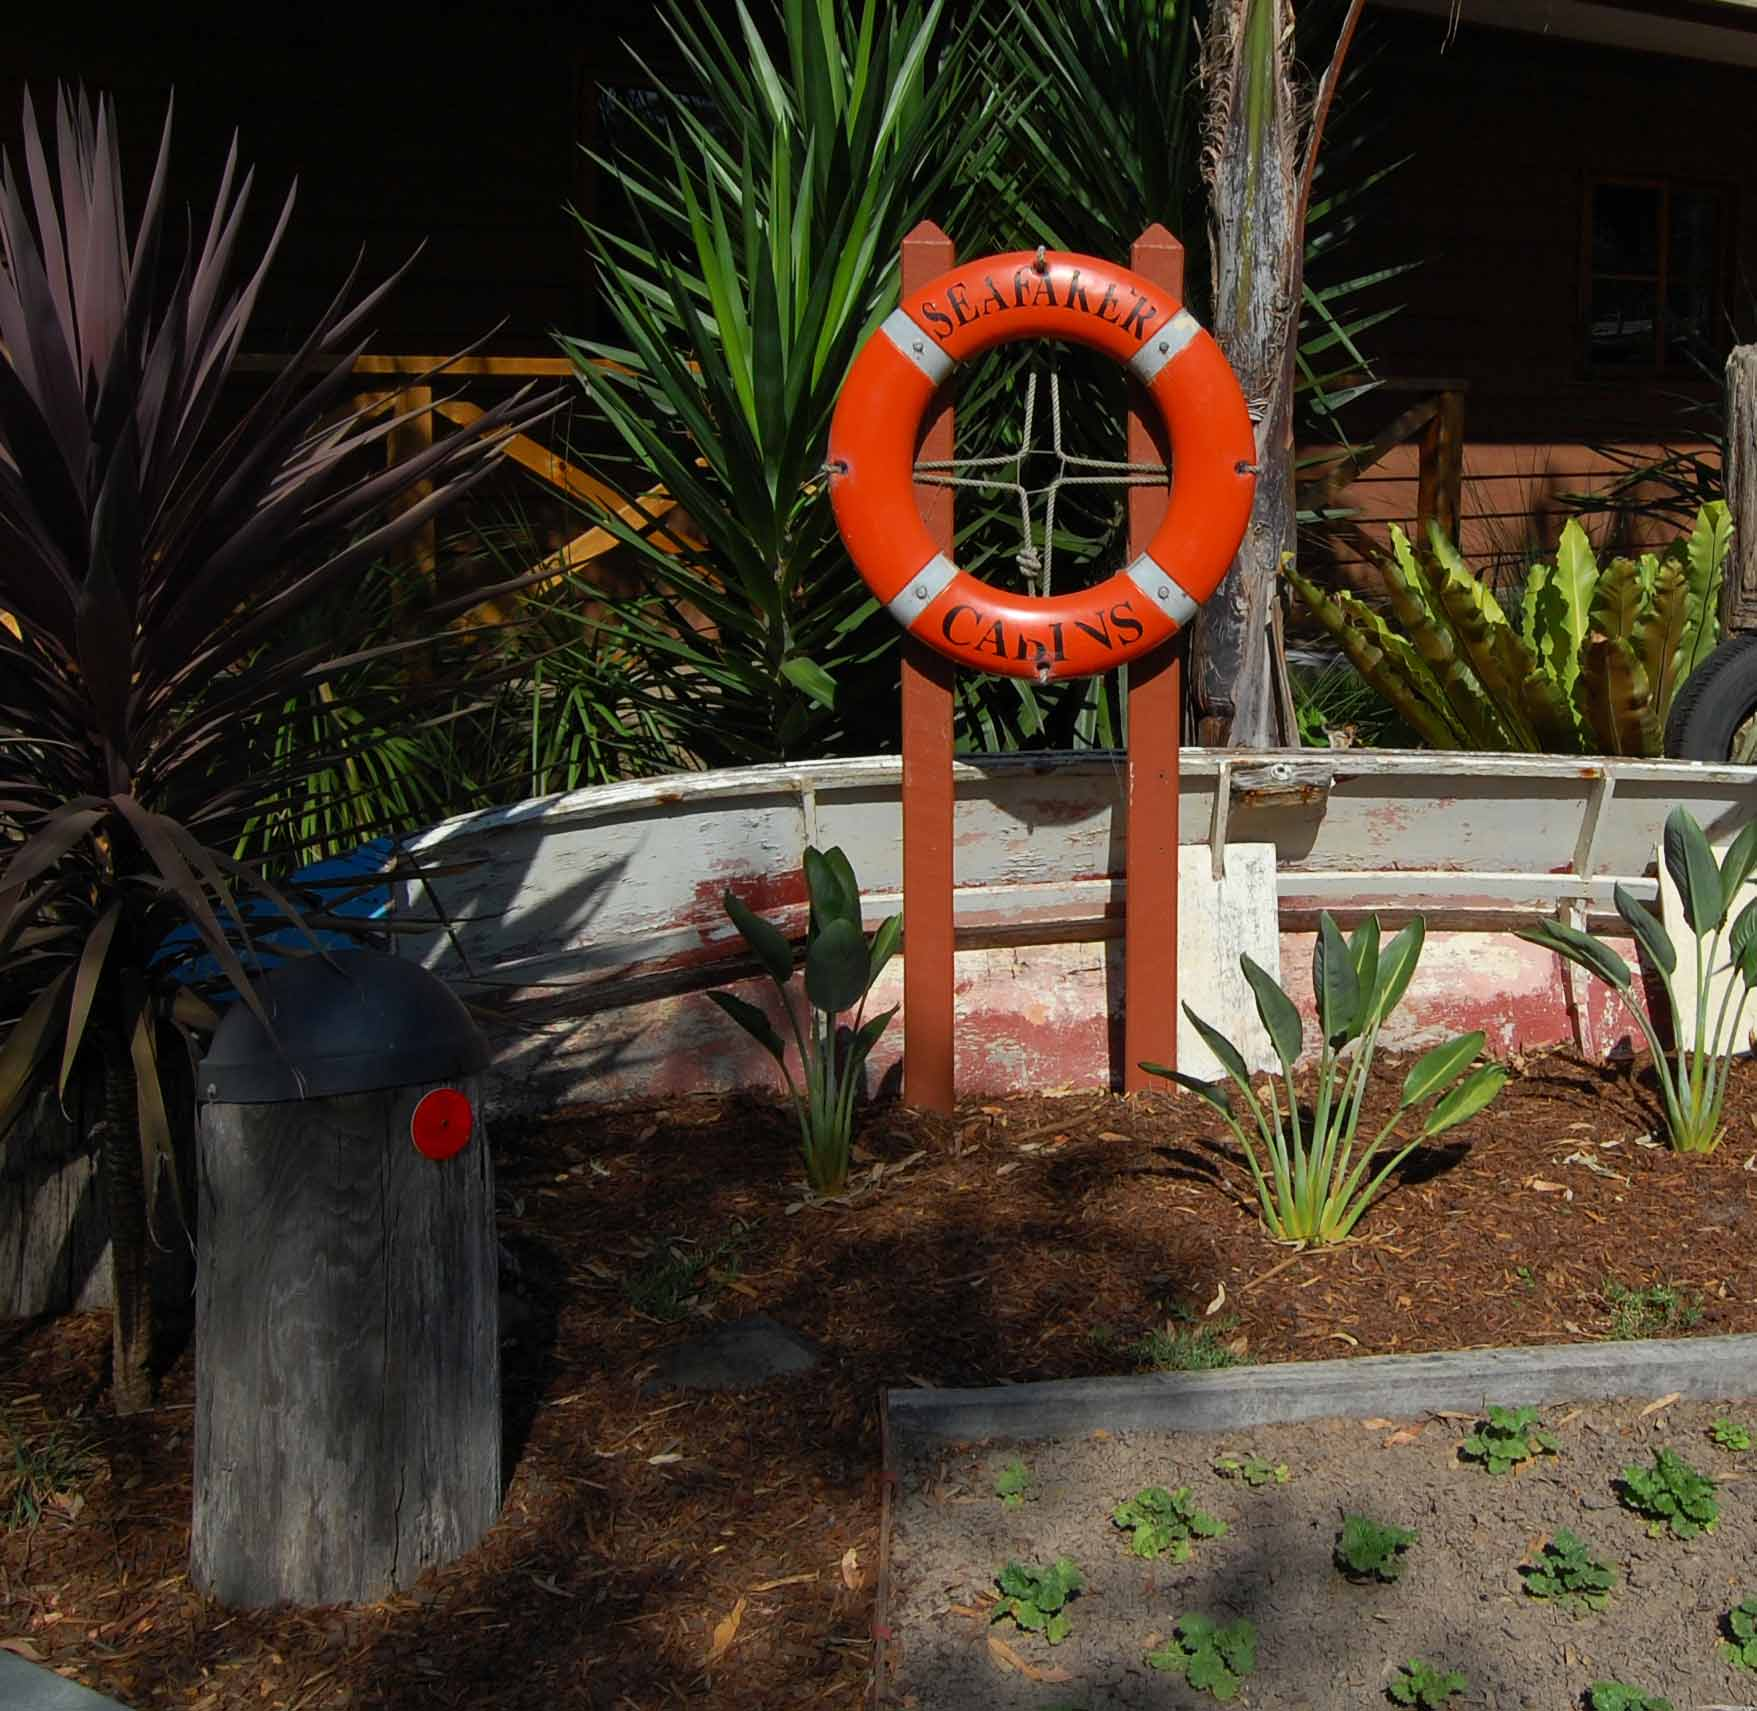 Seafarer Cabins